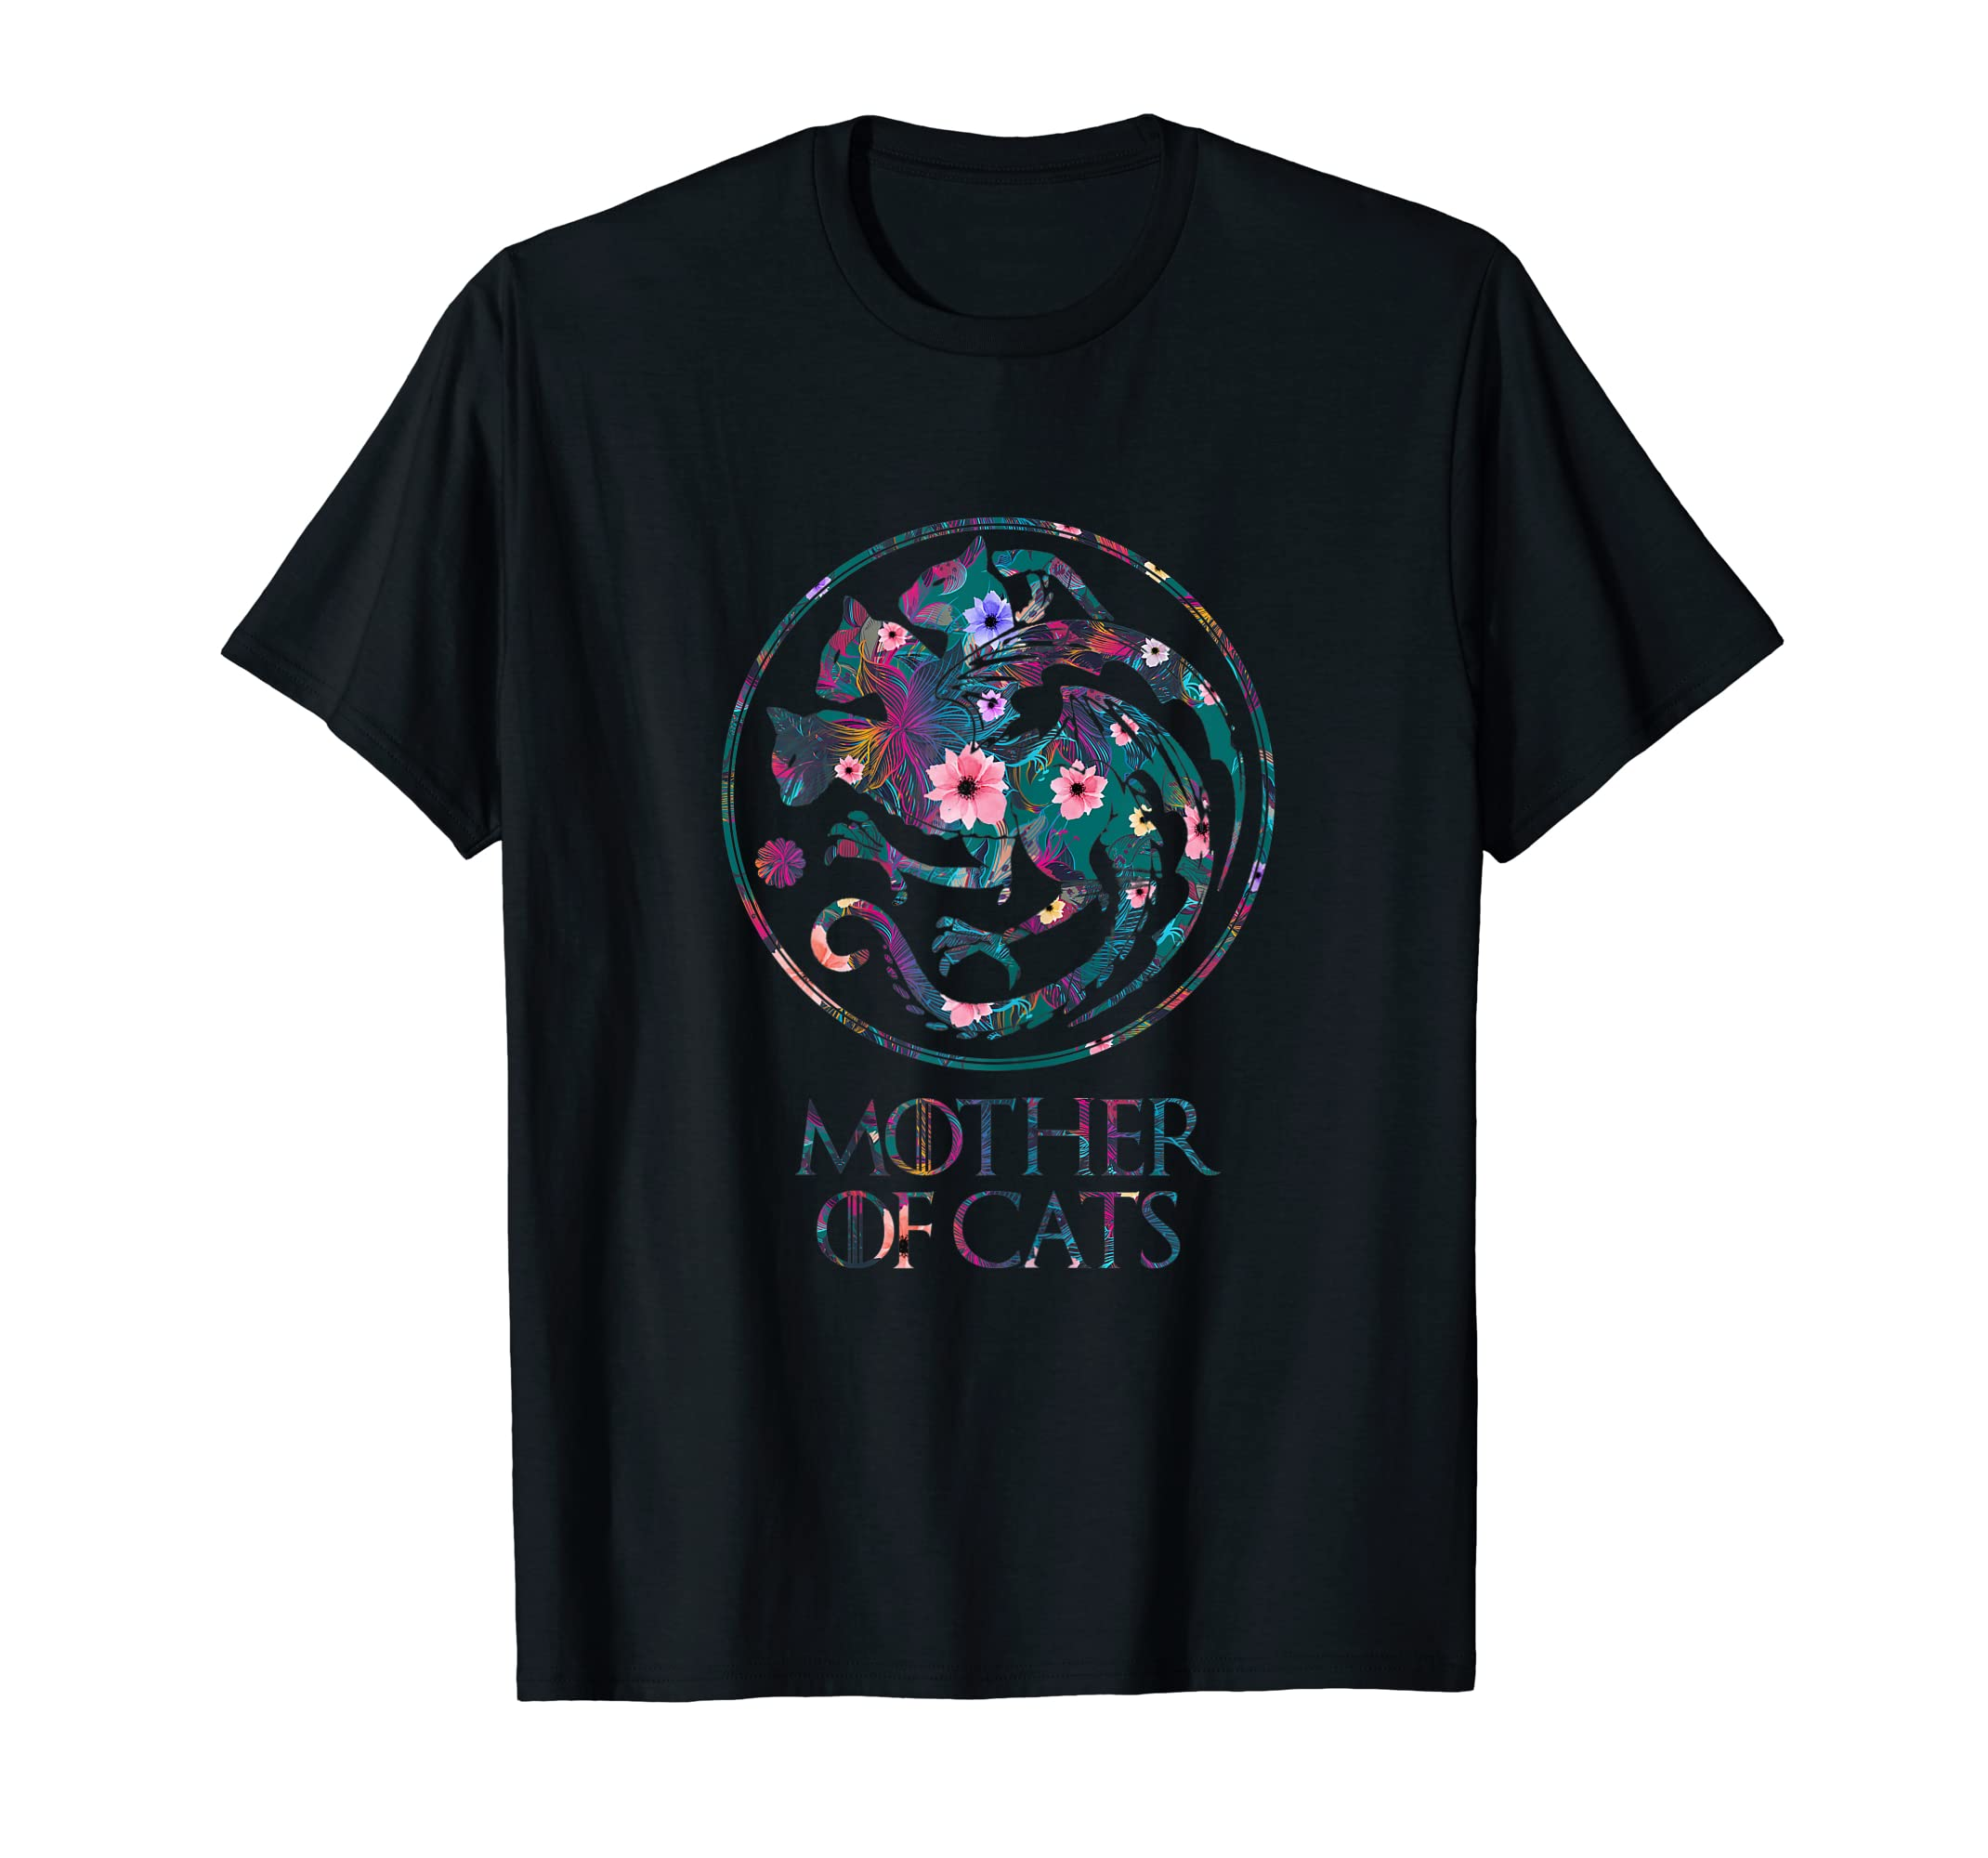 Womens Cat Lovers Shirt Mother of Cats With Floral Art T-Shirt-Men's T-Shirt-Black